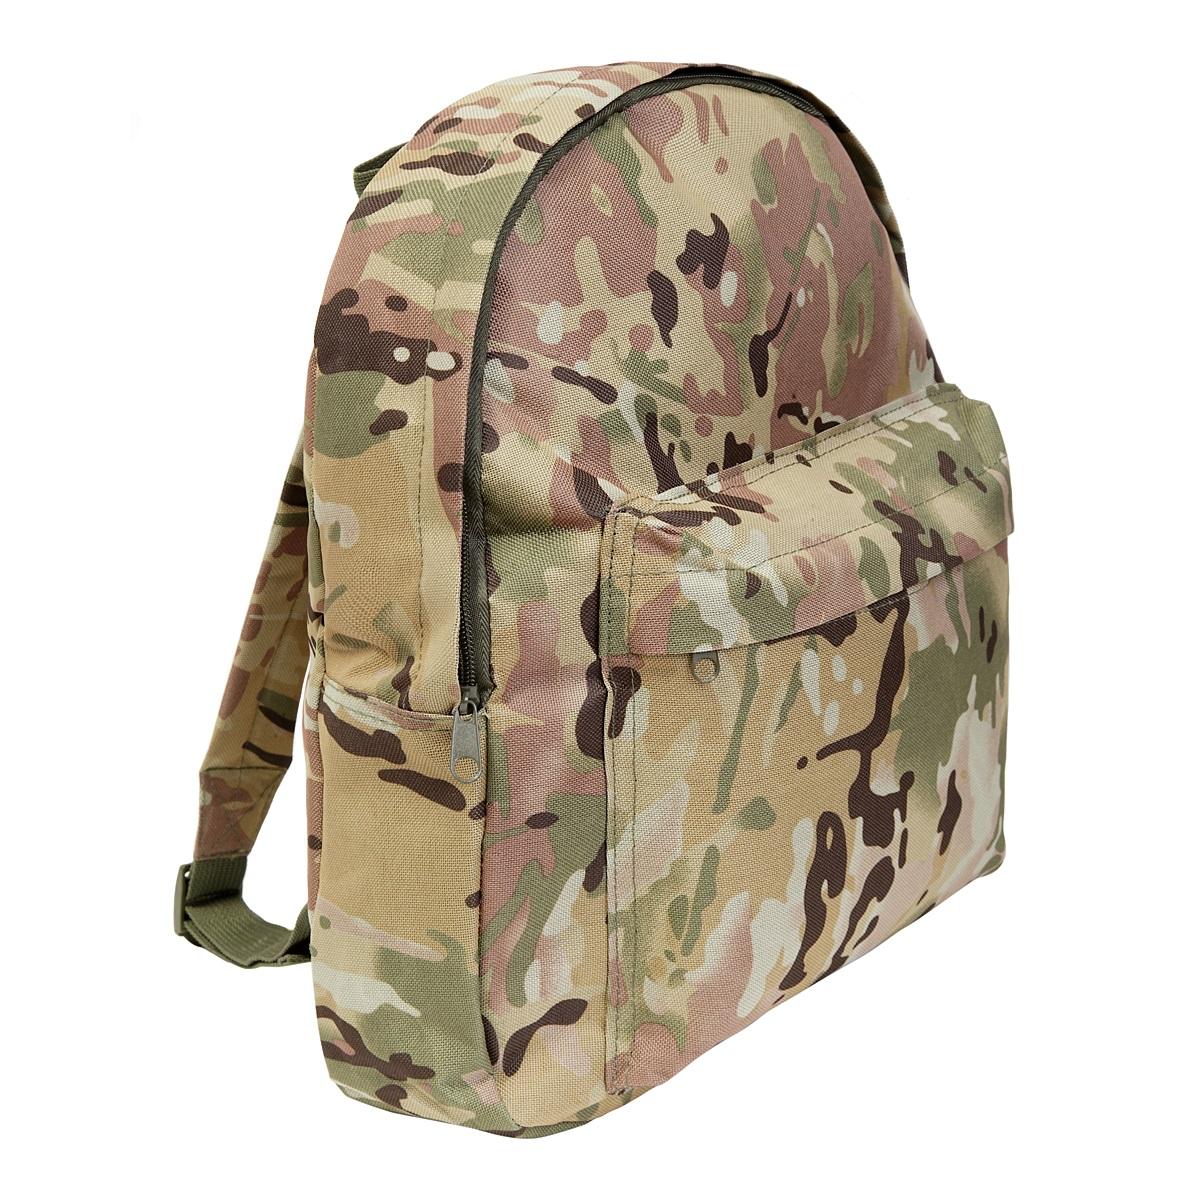 e4742da66800 Kids Mtp Camouflage 15Ltr Rucksack